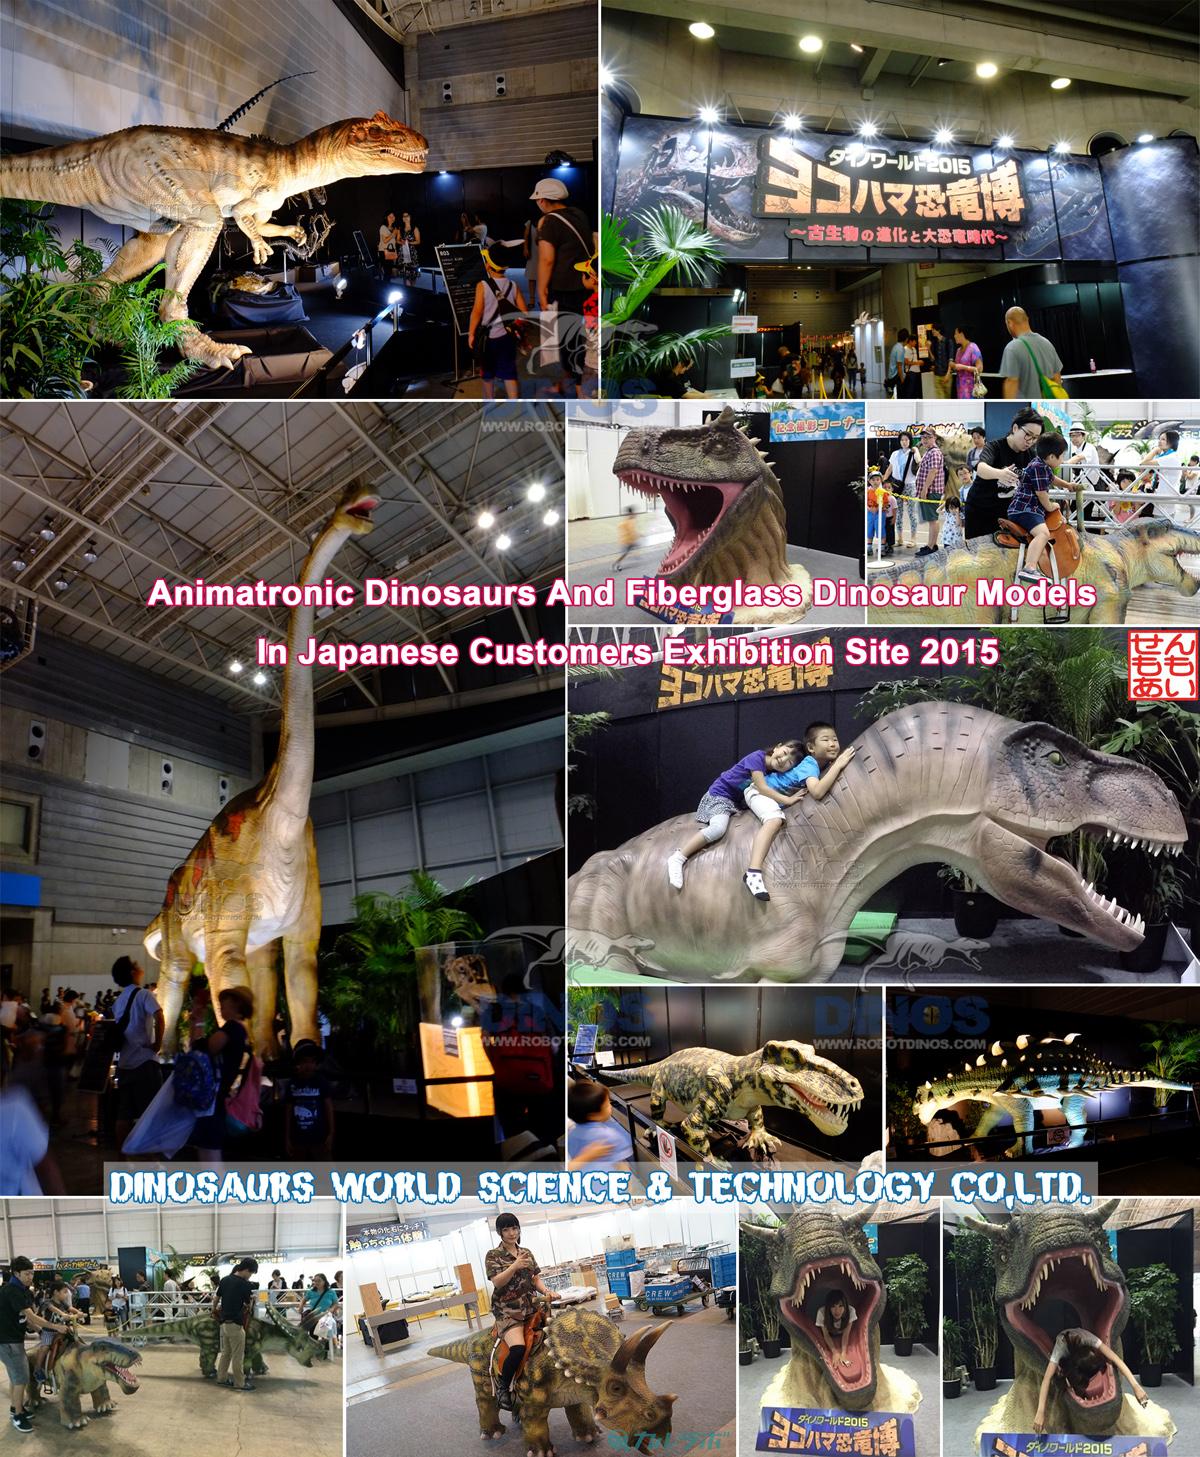 Animatronic Dinosaurs And Fiberglass Dinosaur Models